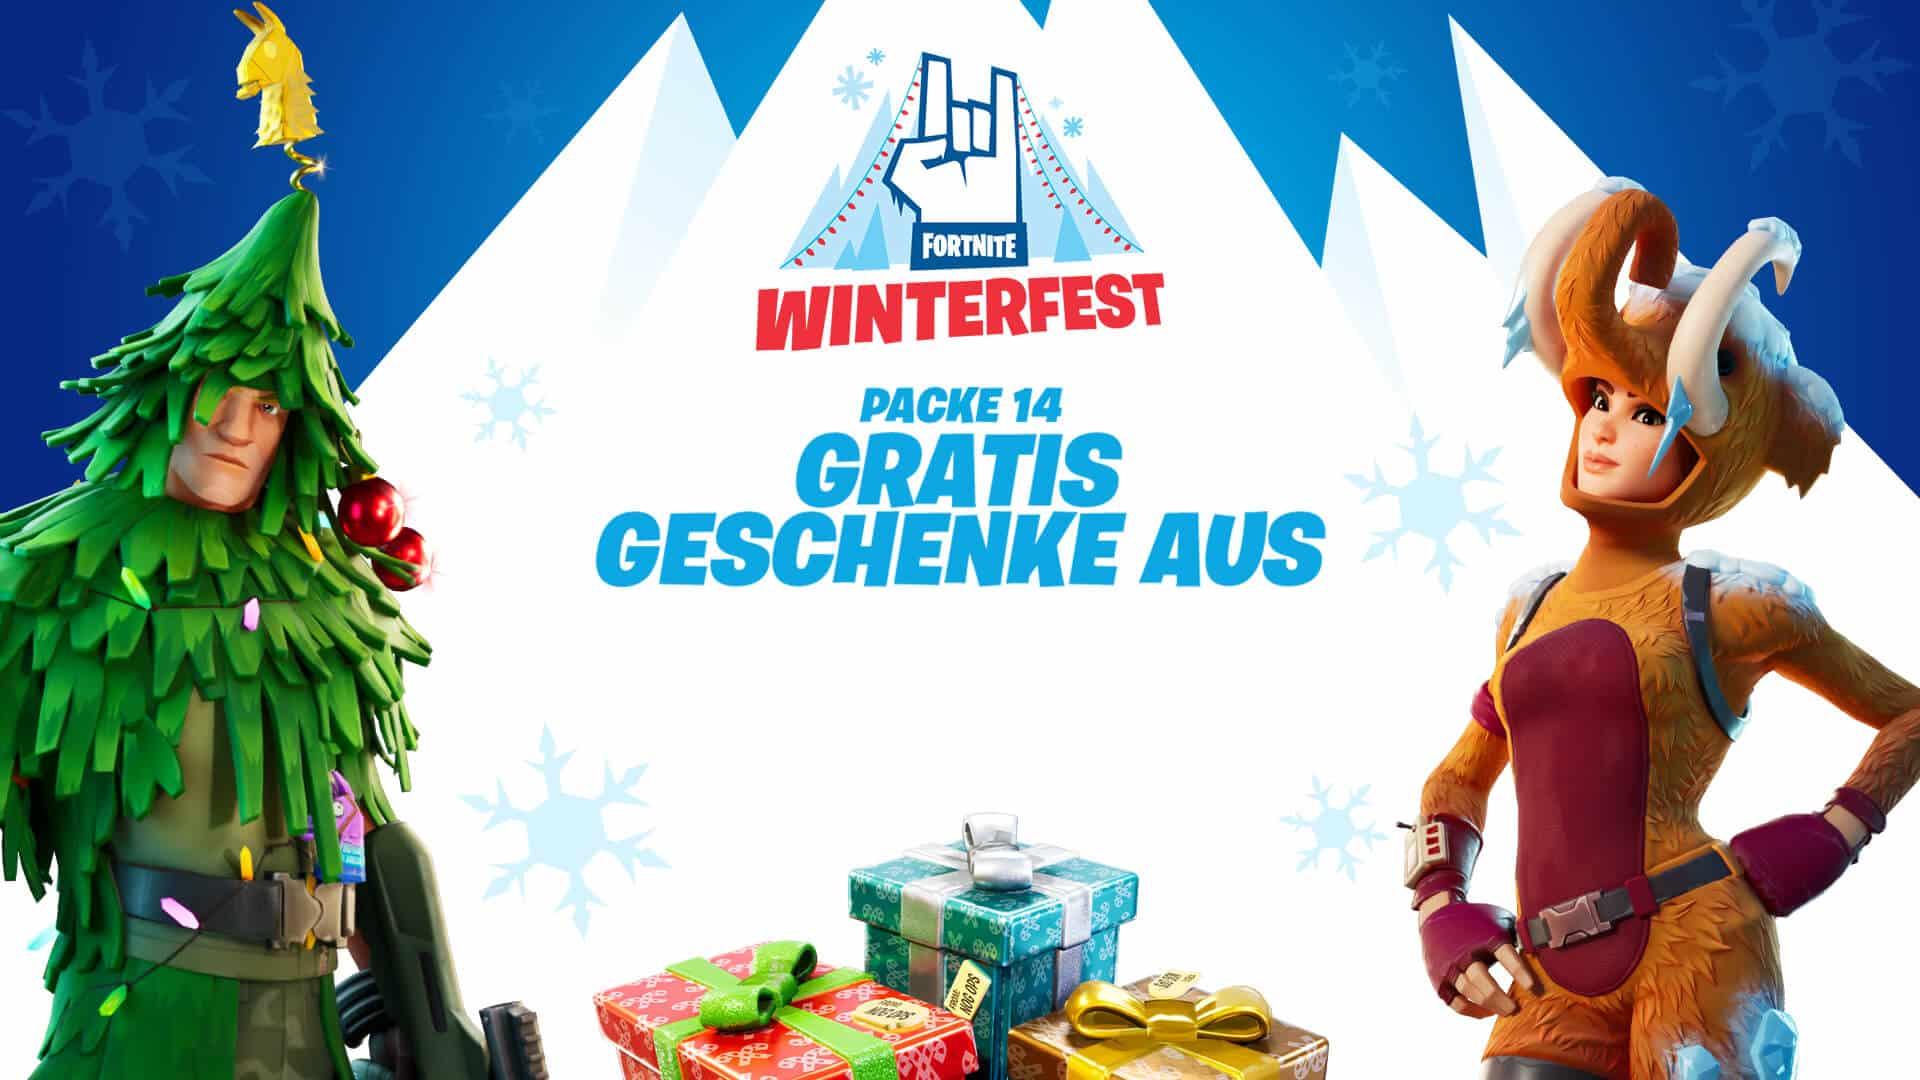 Fortnite blog winterfest 2019 begins DE 11BR WinterFest Announce Social 1920x1080 377b308242e1d793fb15dc9ba887a43e2c6d5db4